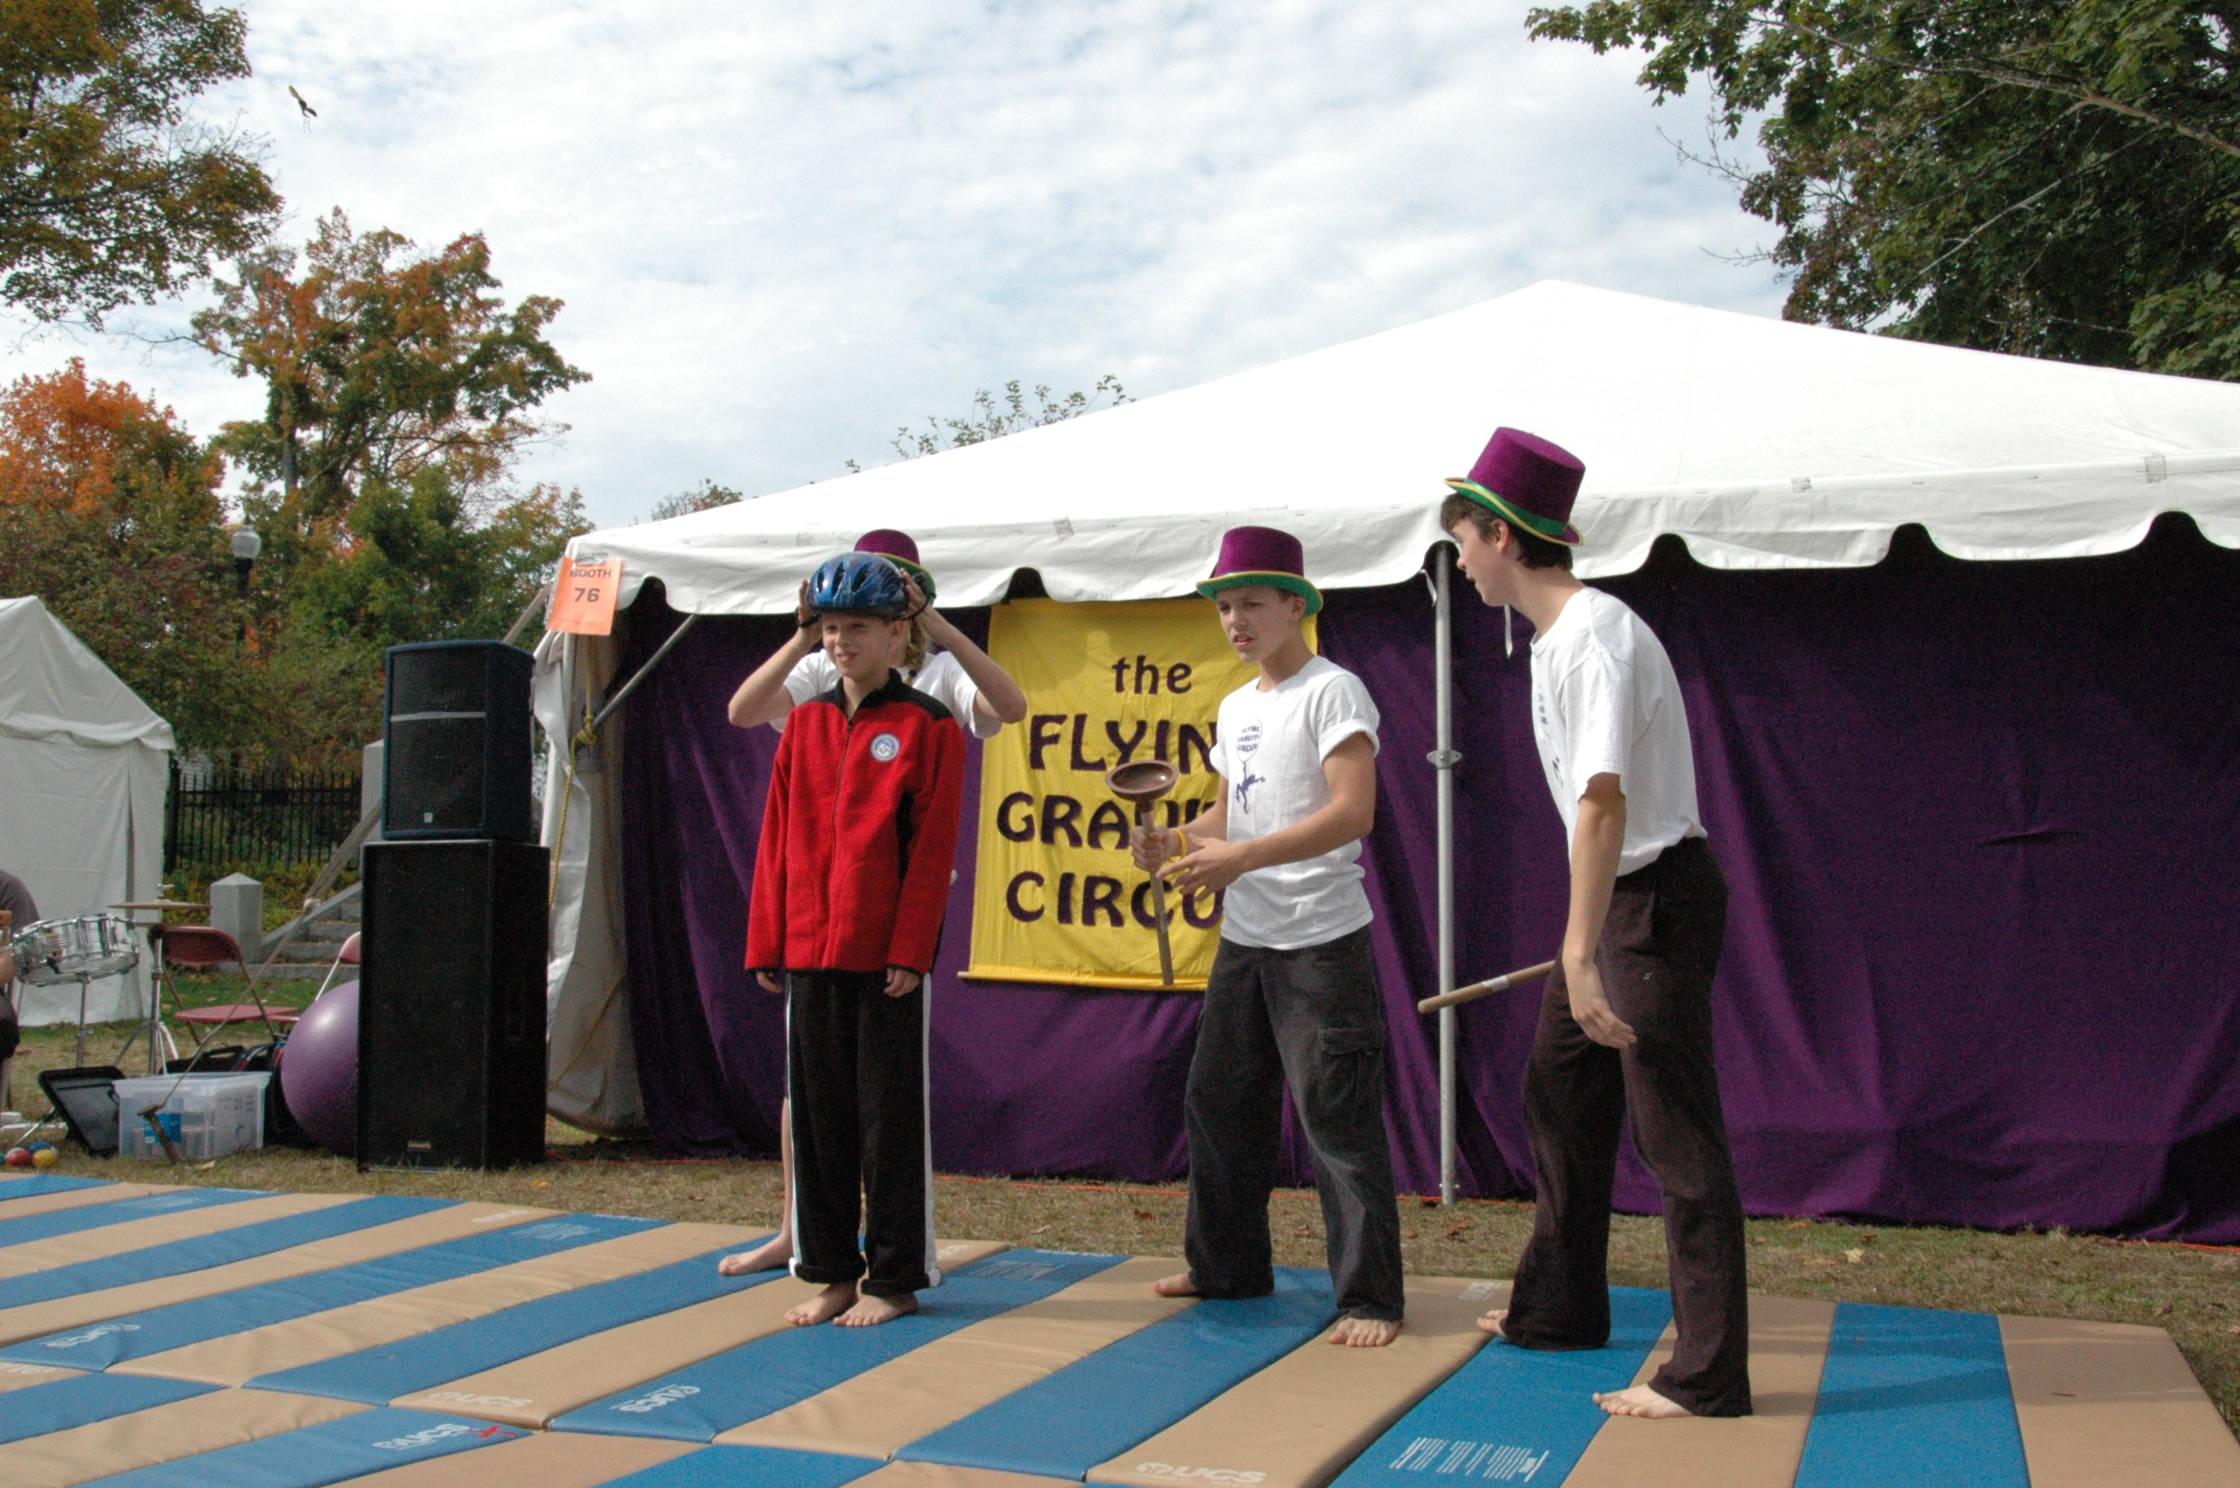 2012-10-06 Flyin Gravity Circus - Pumpkin 029.JPG